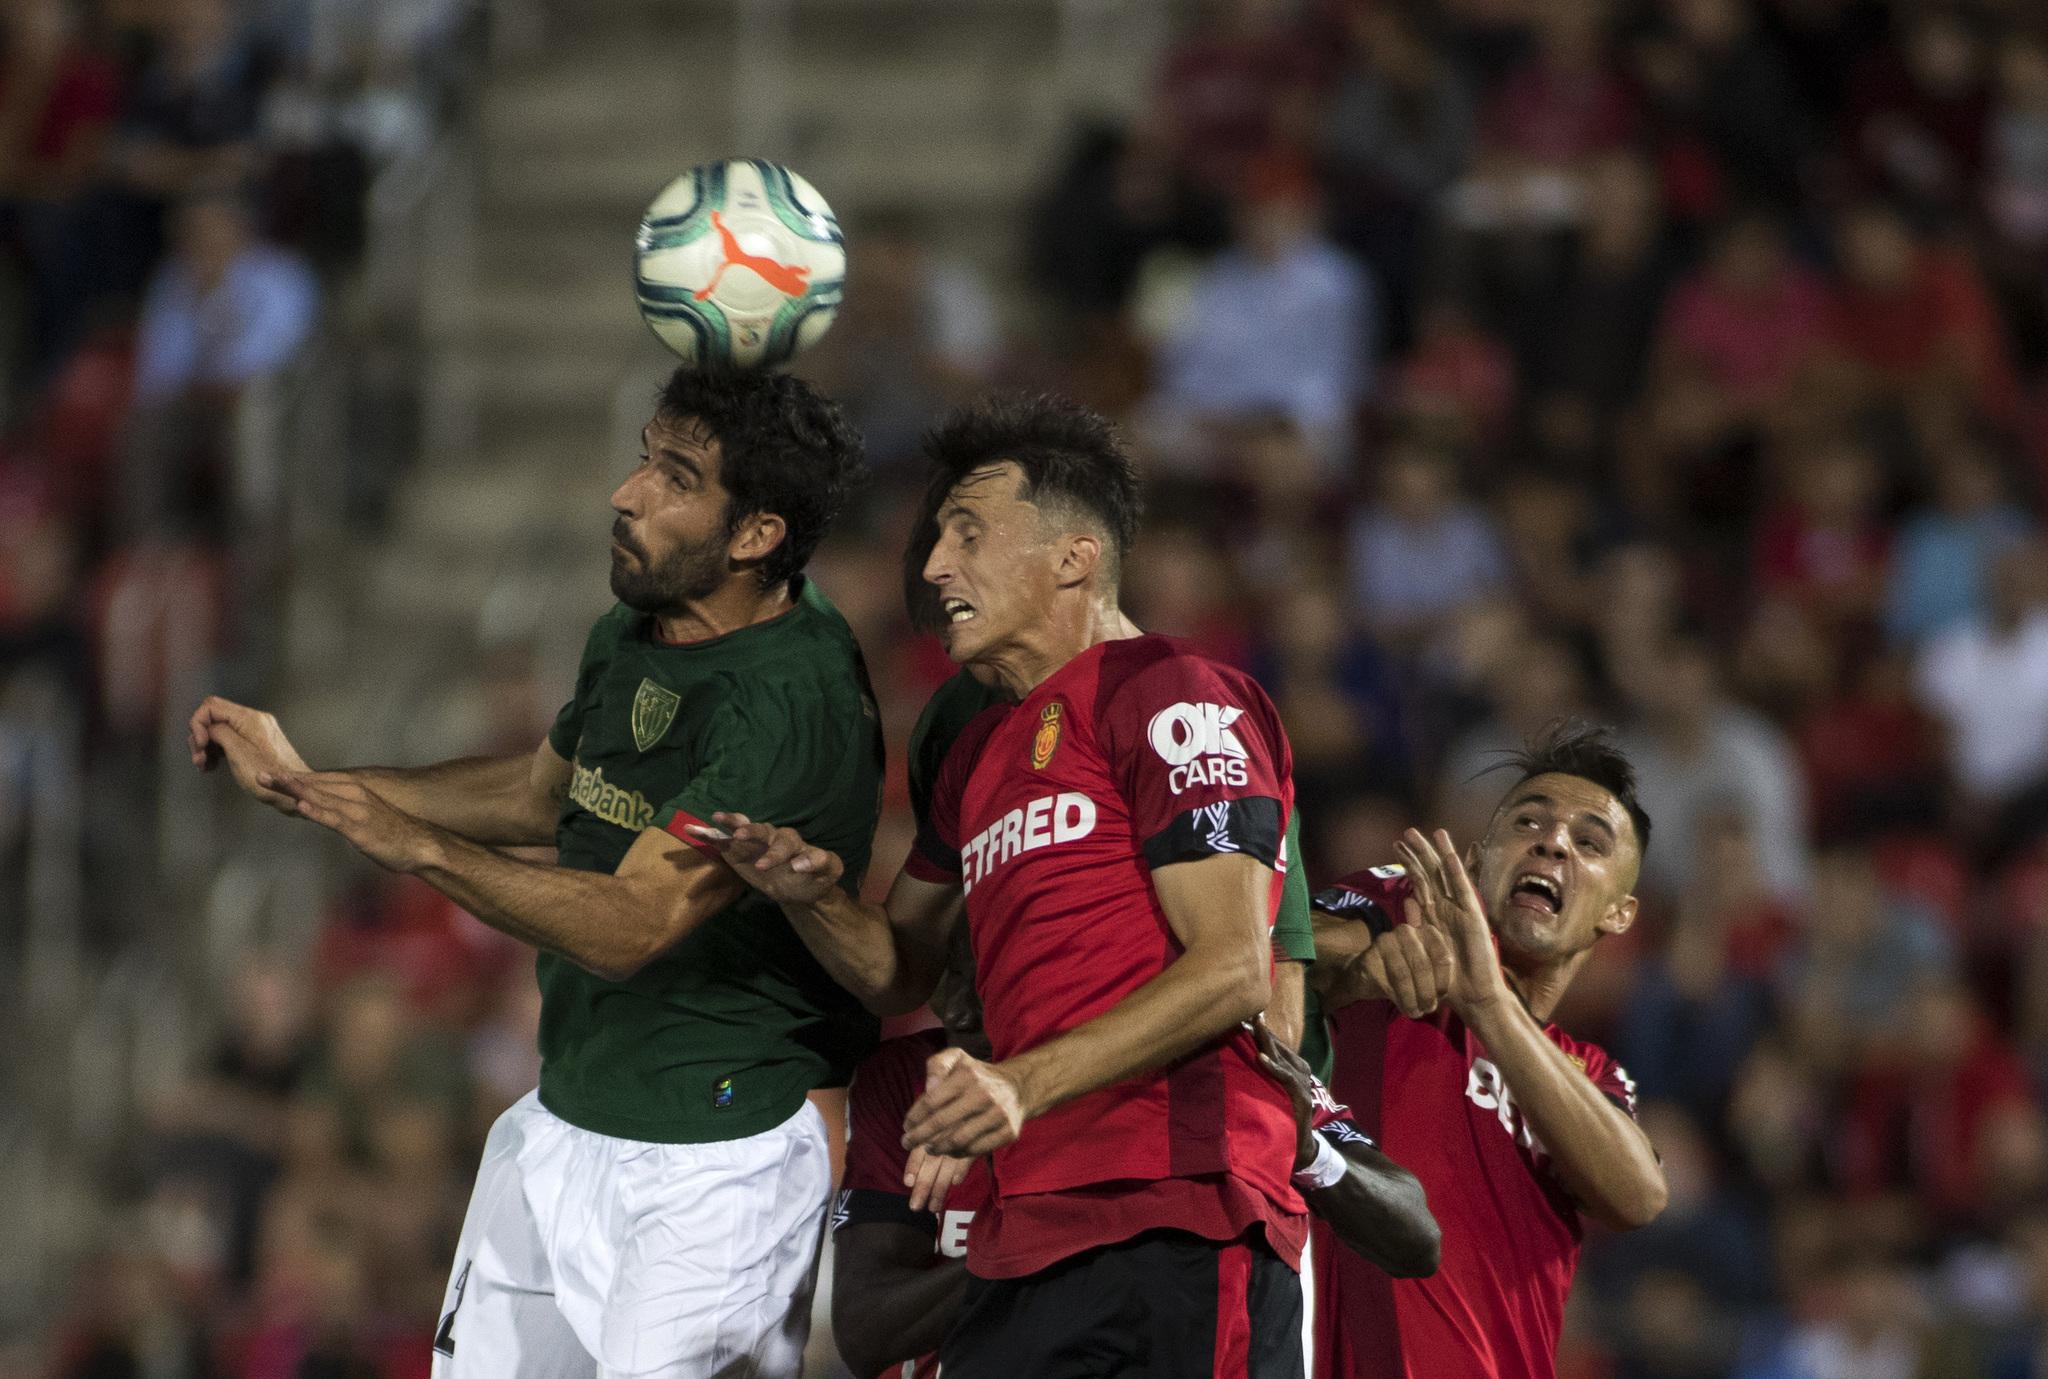 RCD Mallorca vs Athletic Club